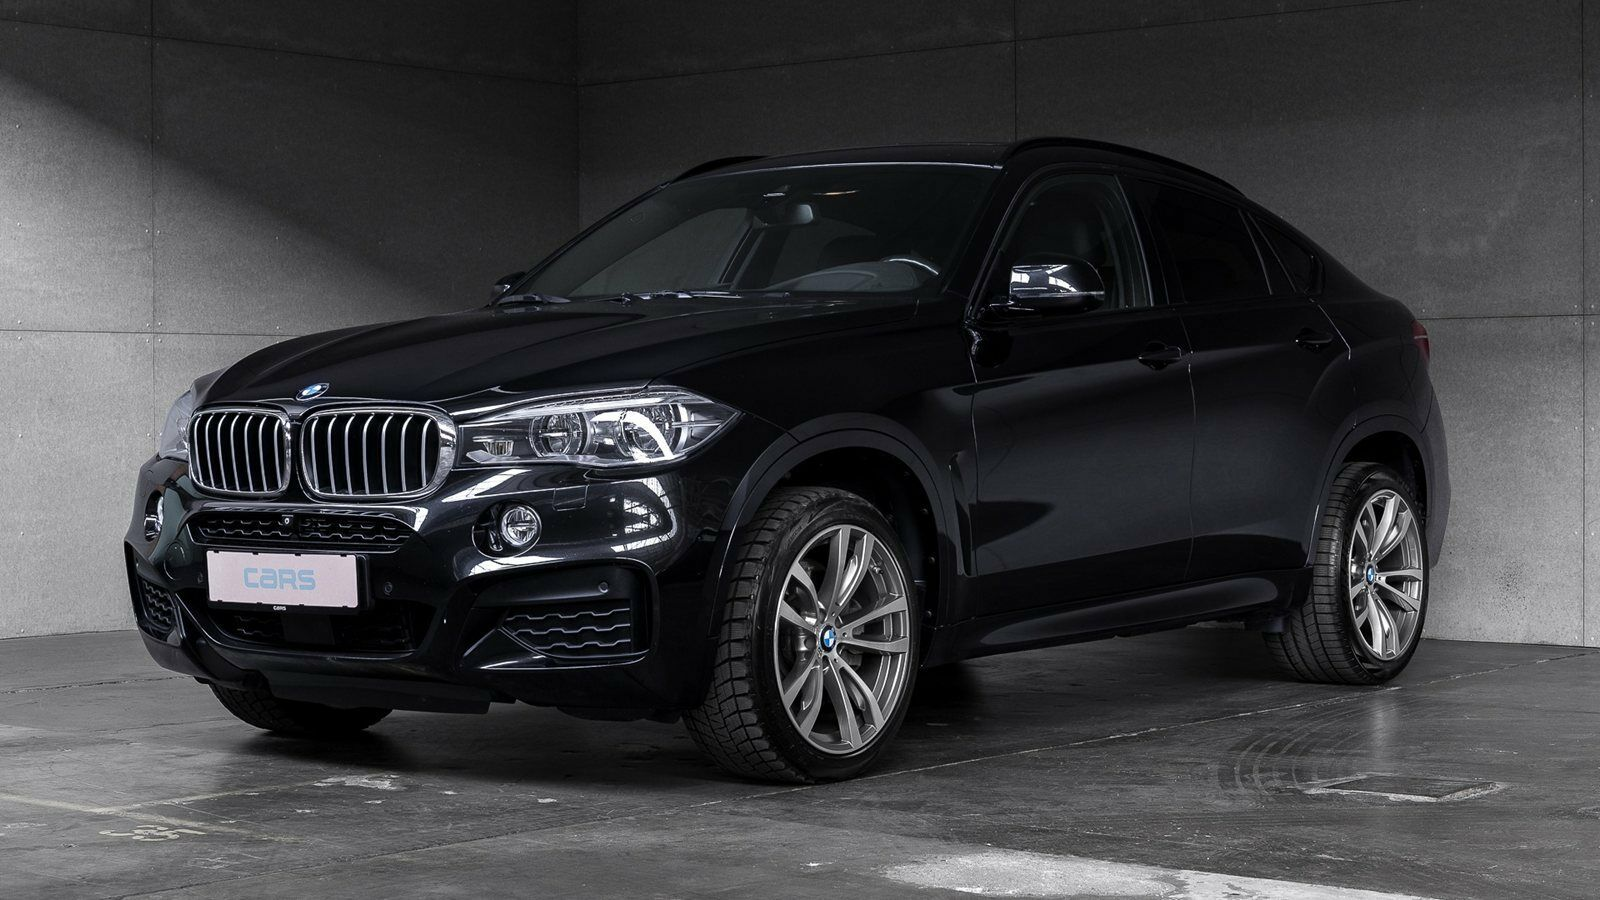 BMW X6 4,4 xDrive50i aut. 5d - 6.495 kr.